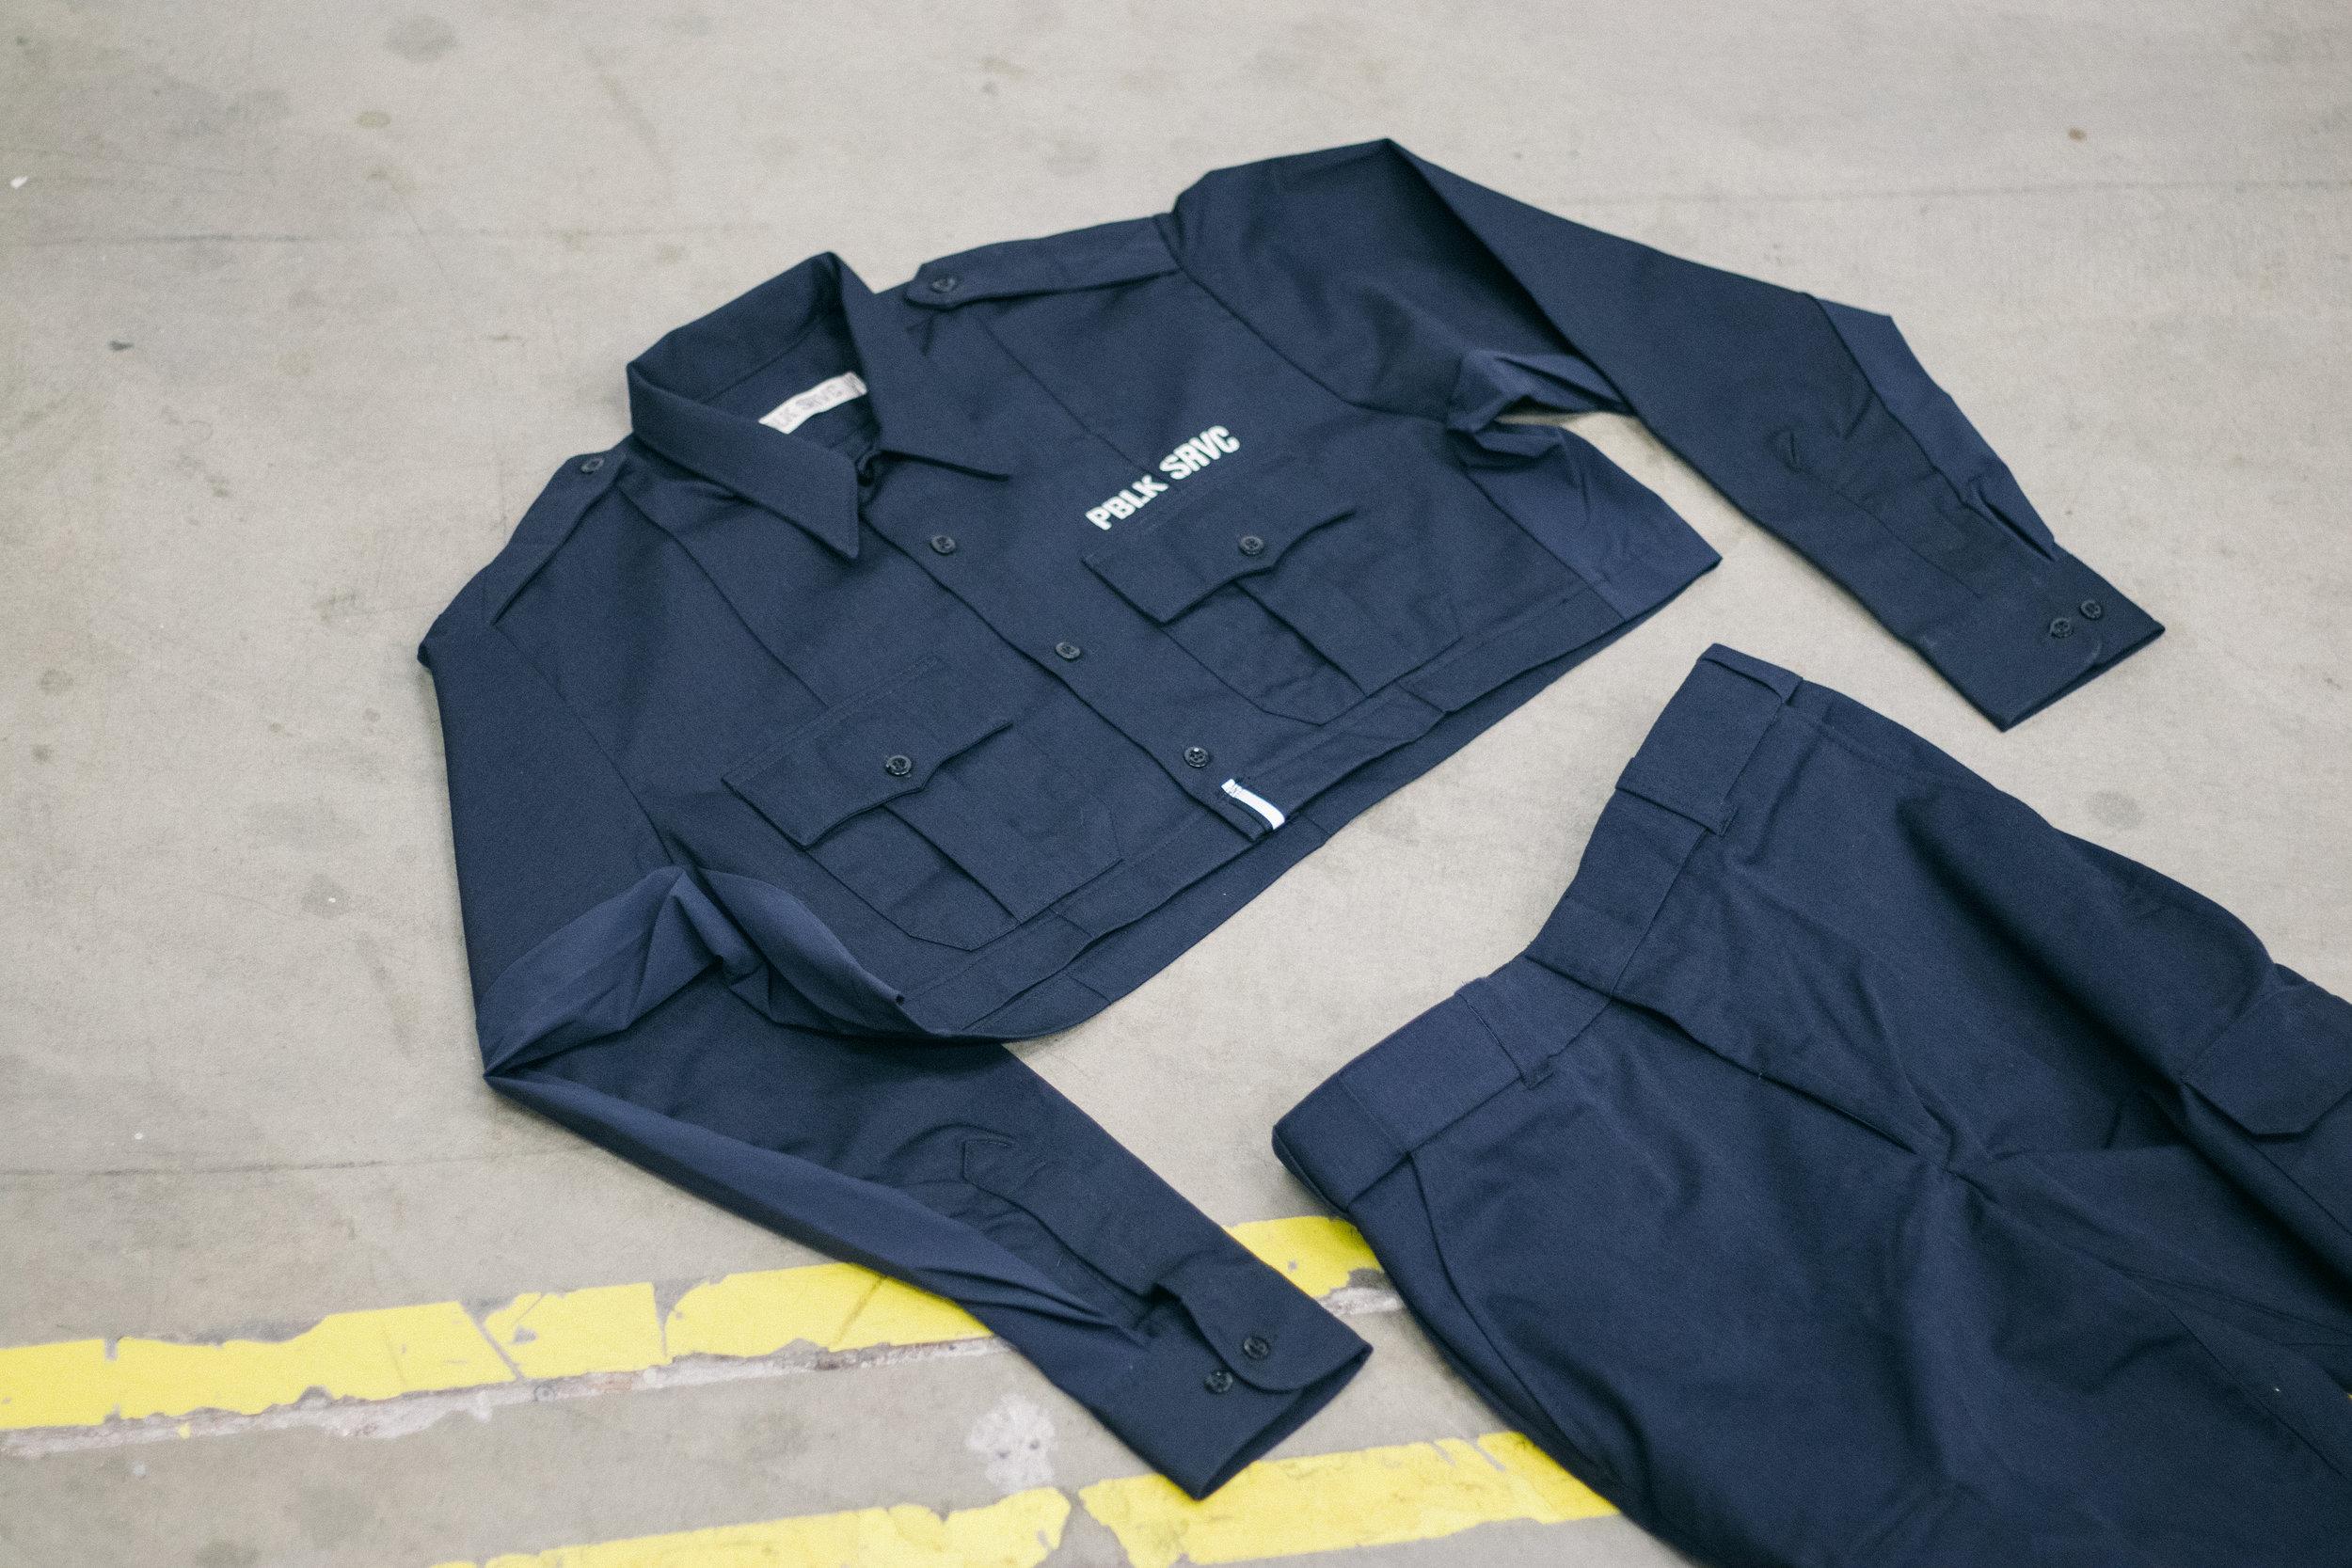 Service Cargo Pant and Service Uniform shirt at  Toolbox LA .